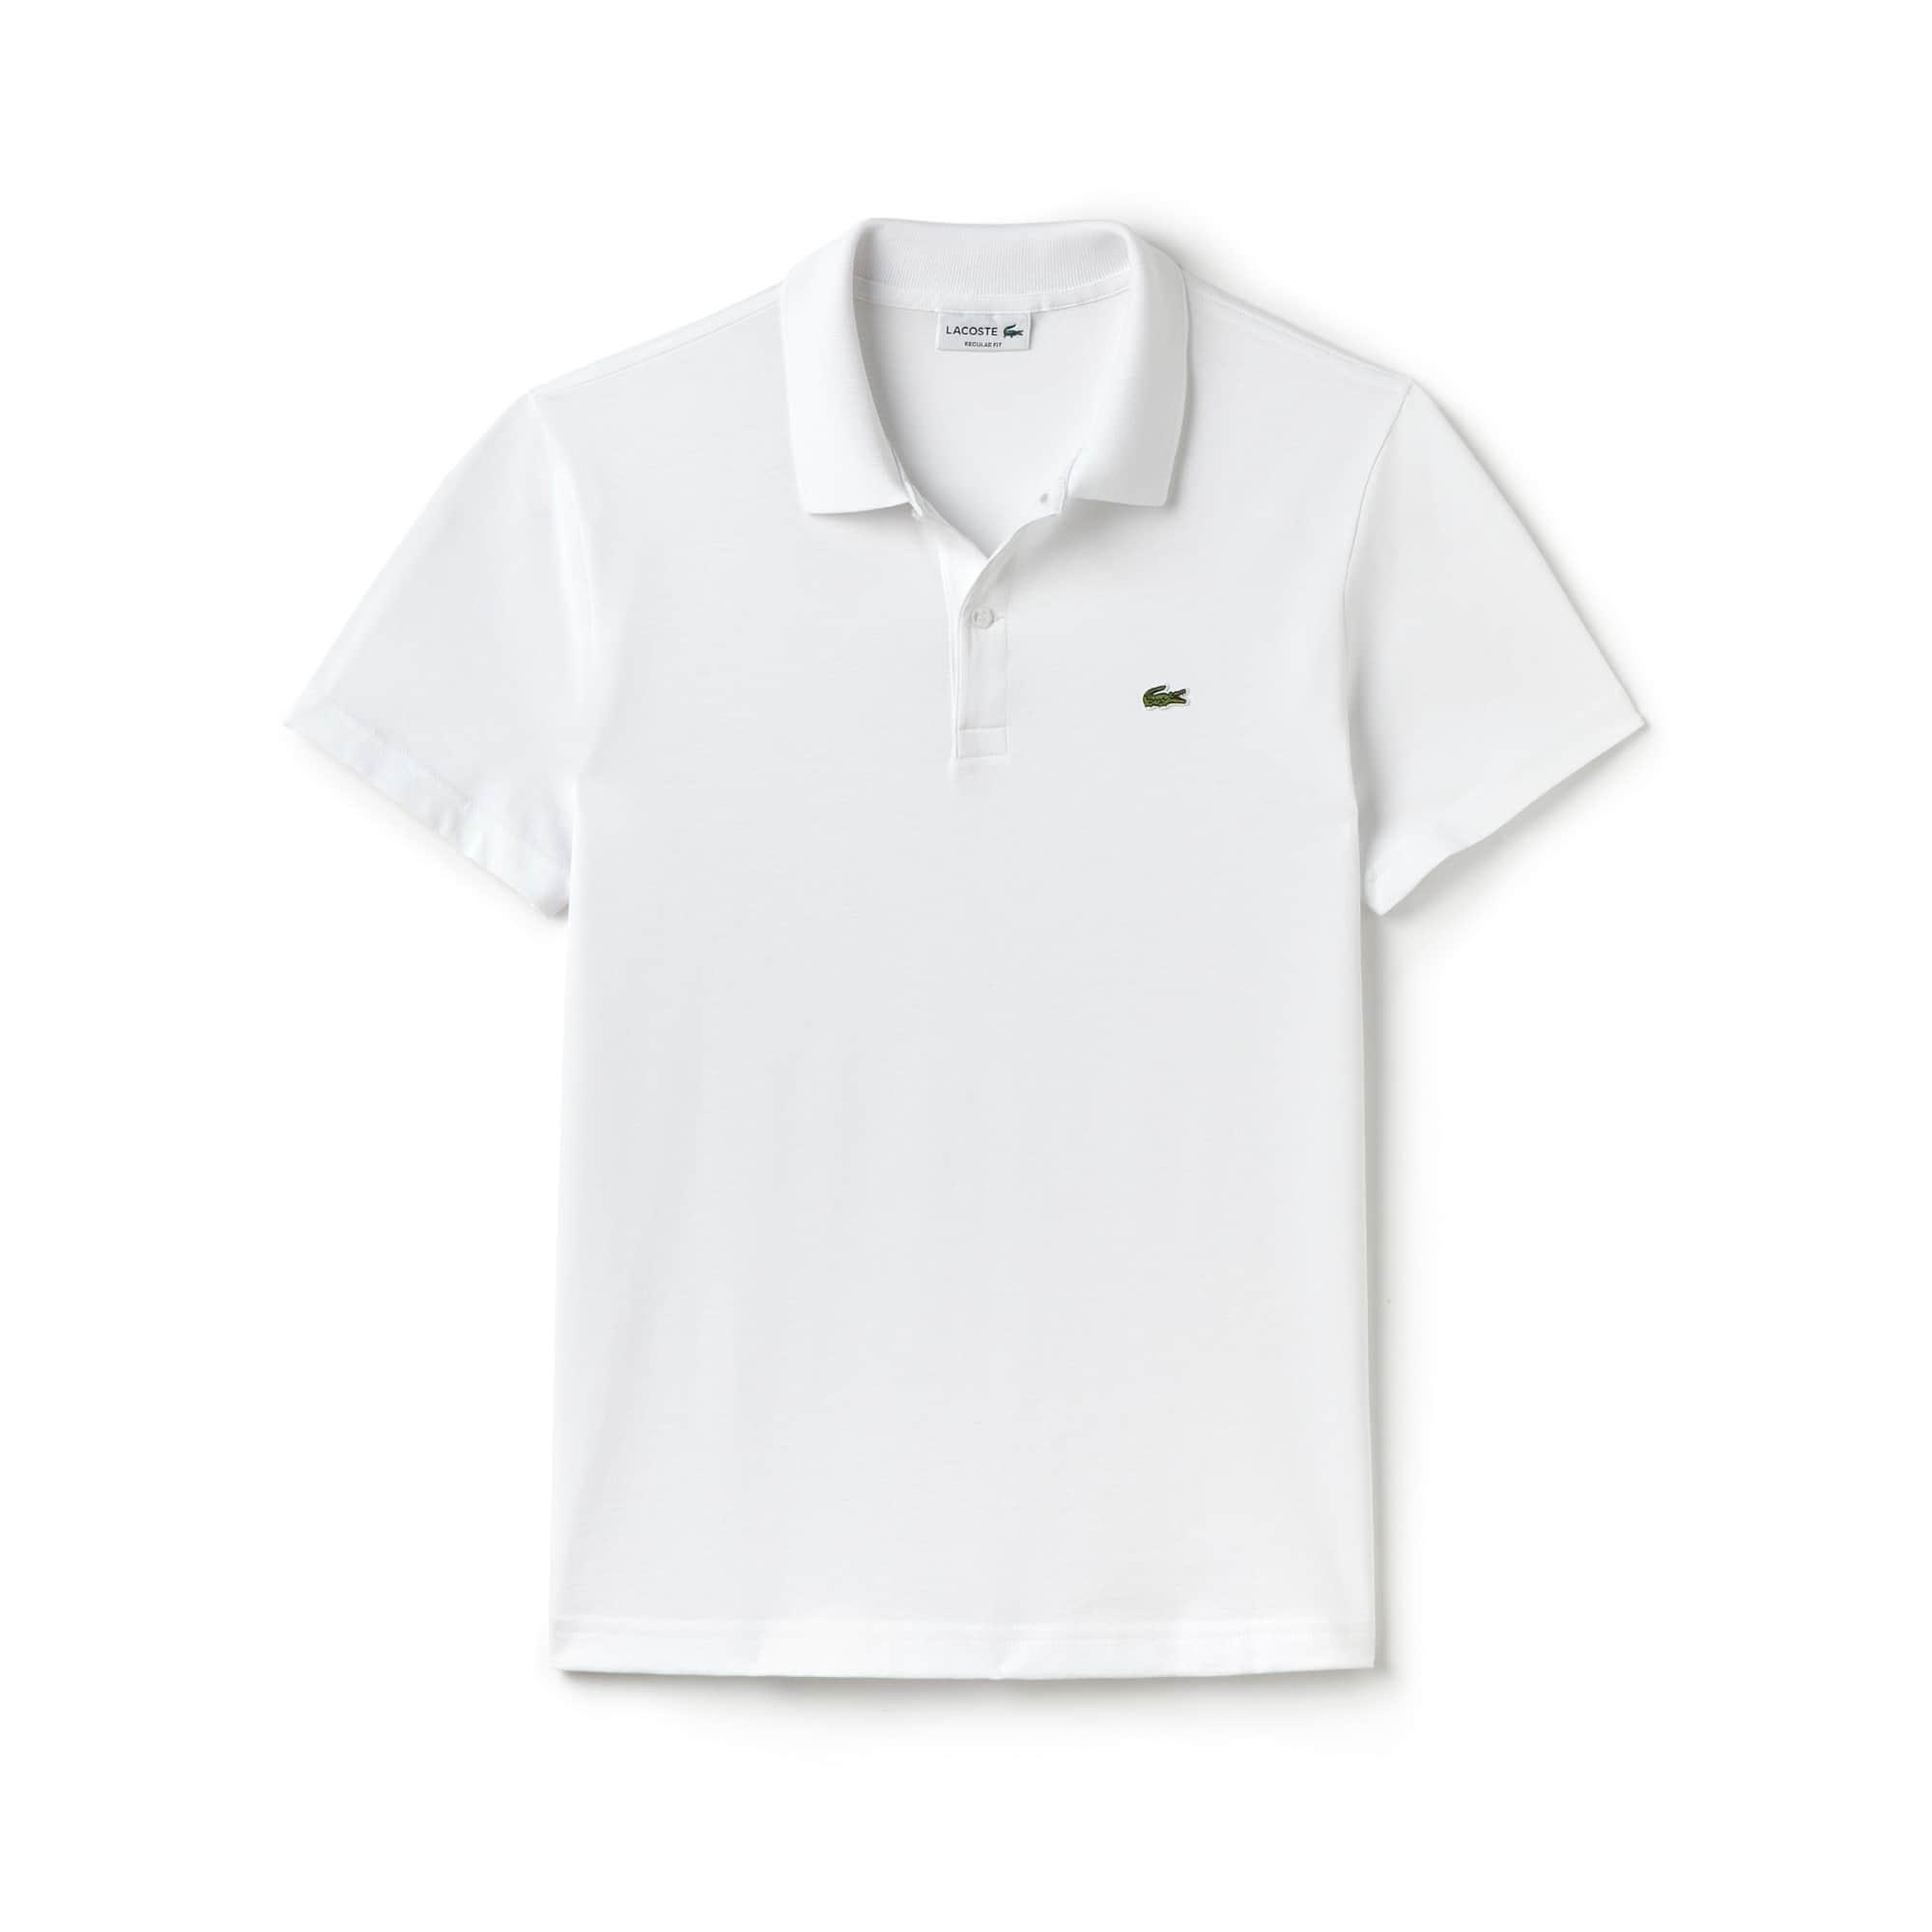 b18e5853f25a9 Camisas polo para homens, manga longa e manga curta   LACOSTE